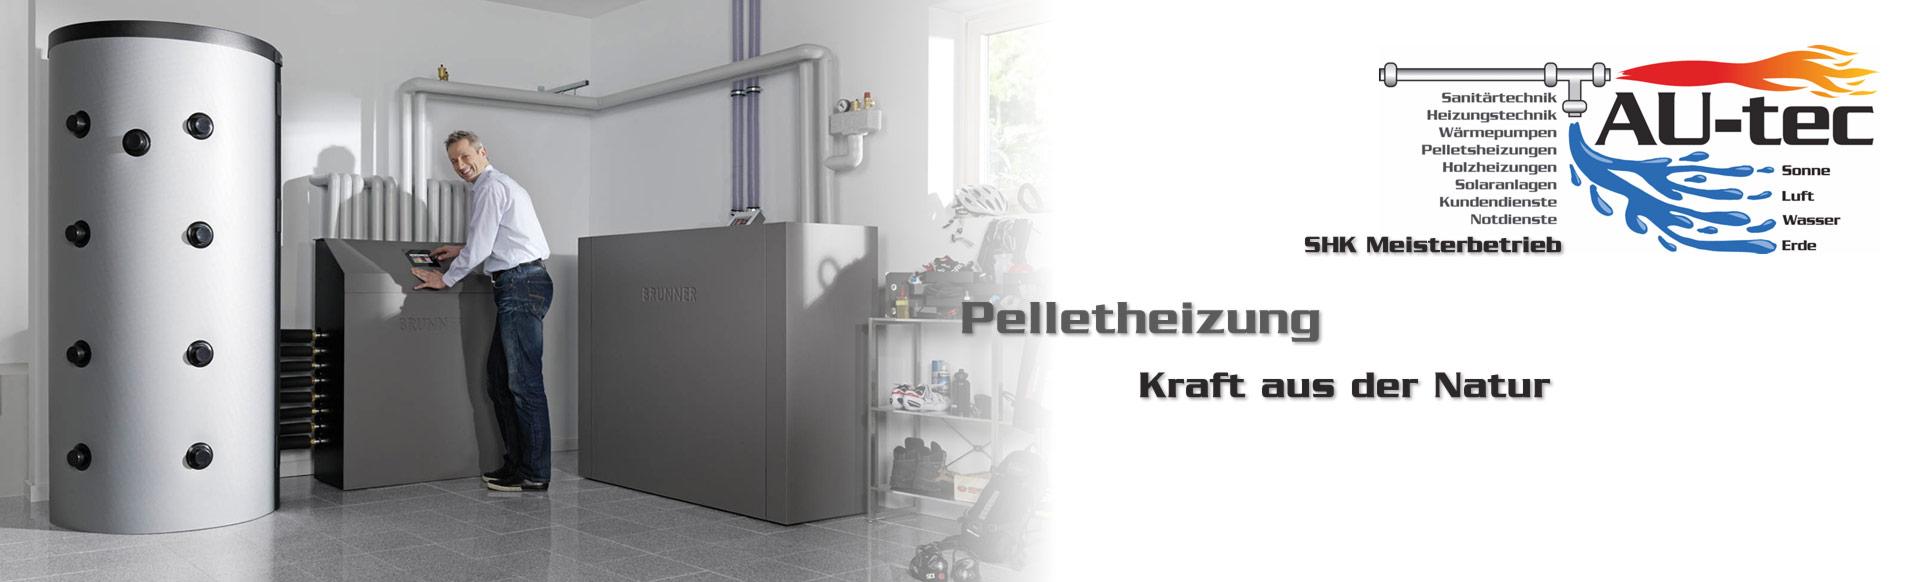 pelletheizung-rastatt-header-autecnet